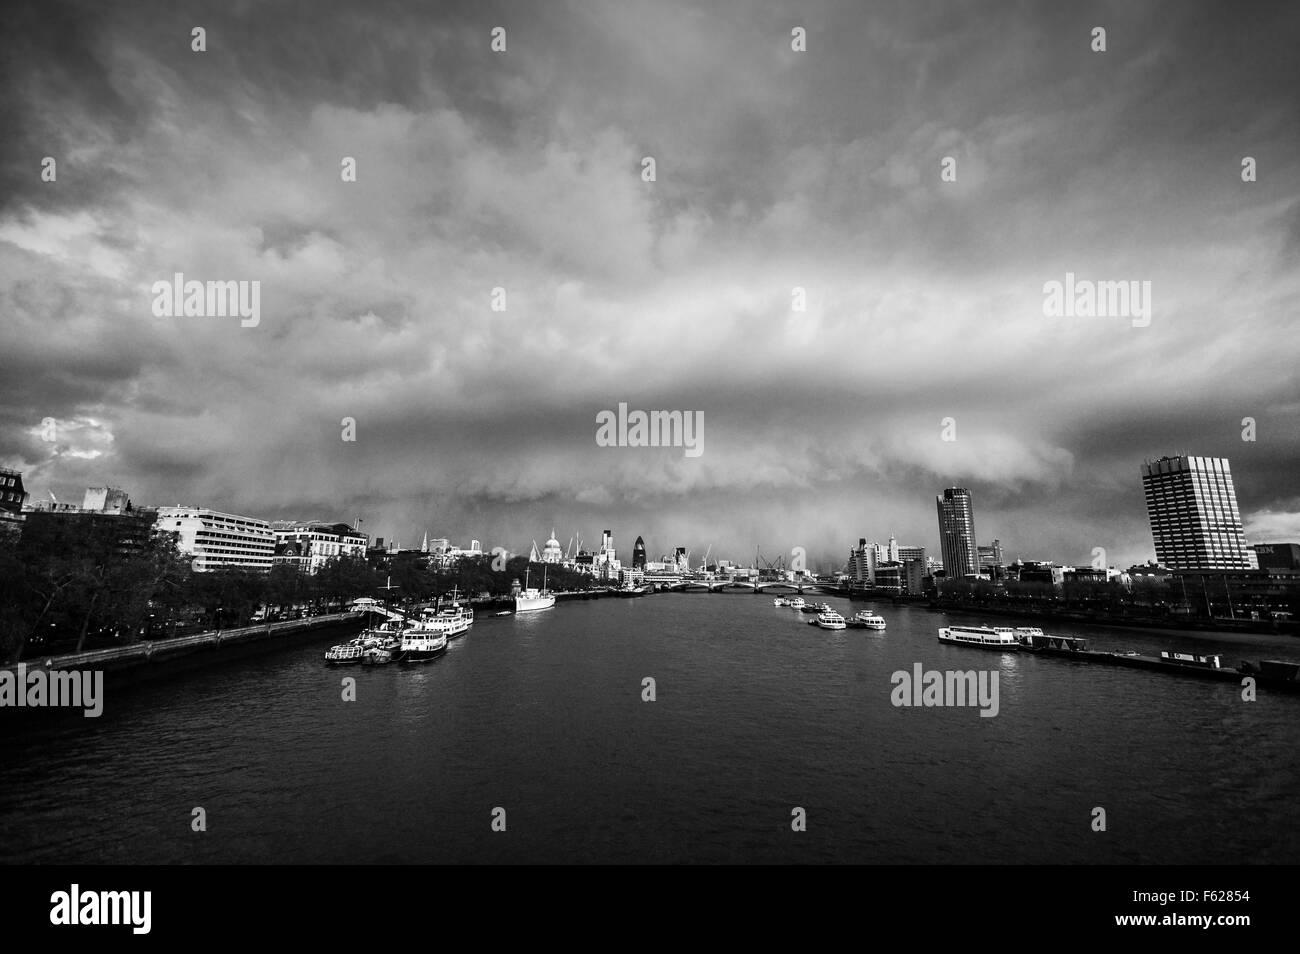 Storm over London view from Waterloo bridge - Stock Image